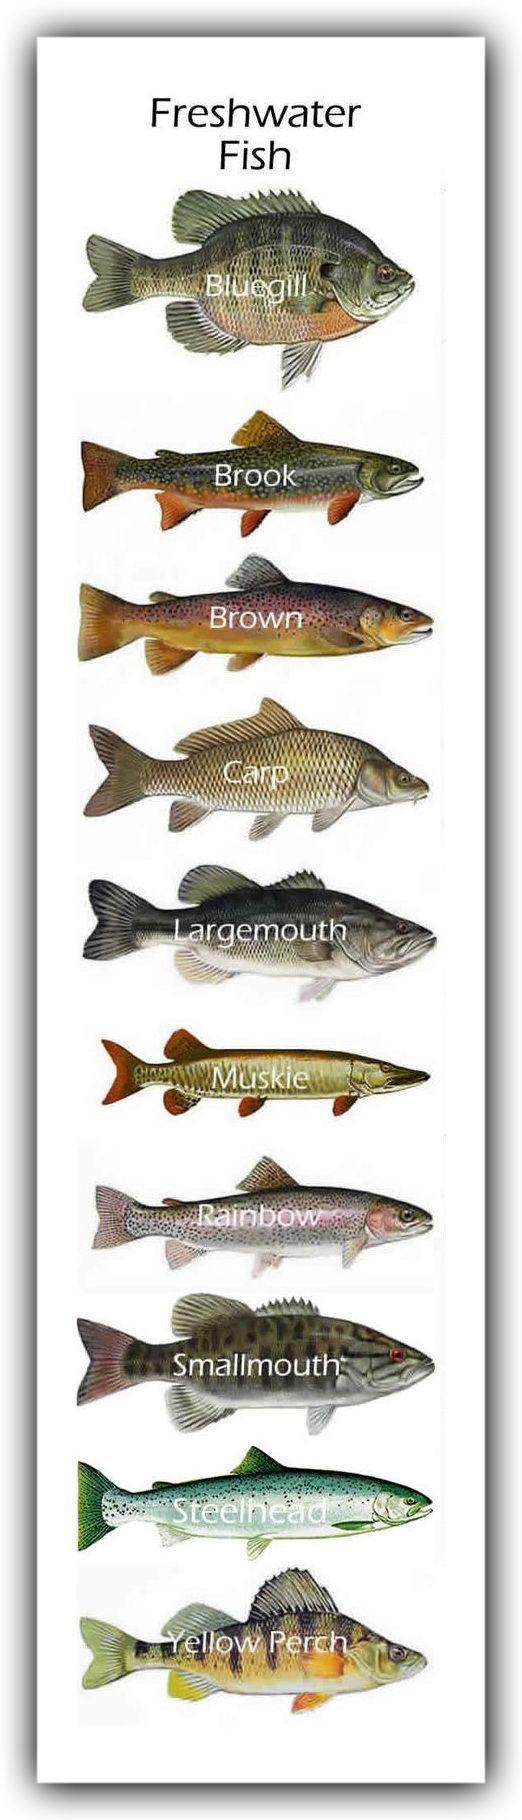 Freshwater fish online canada - Freshwater Fish